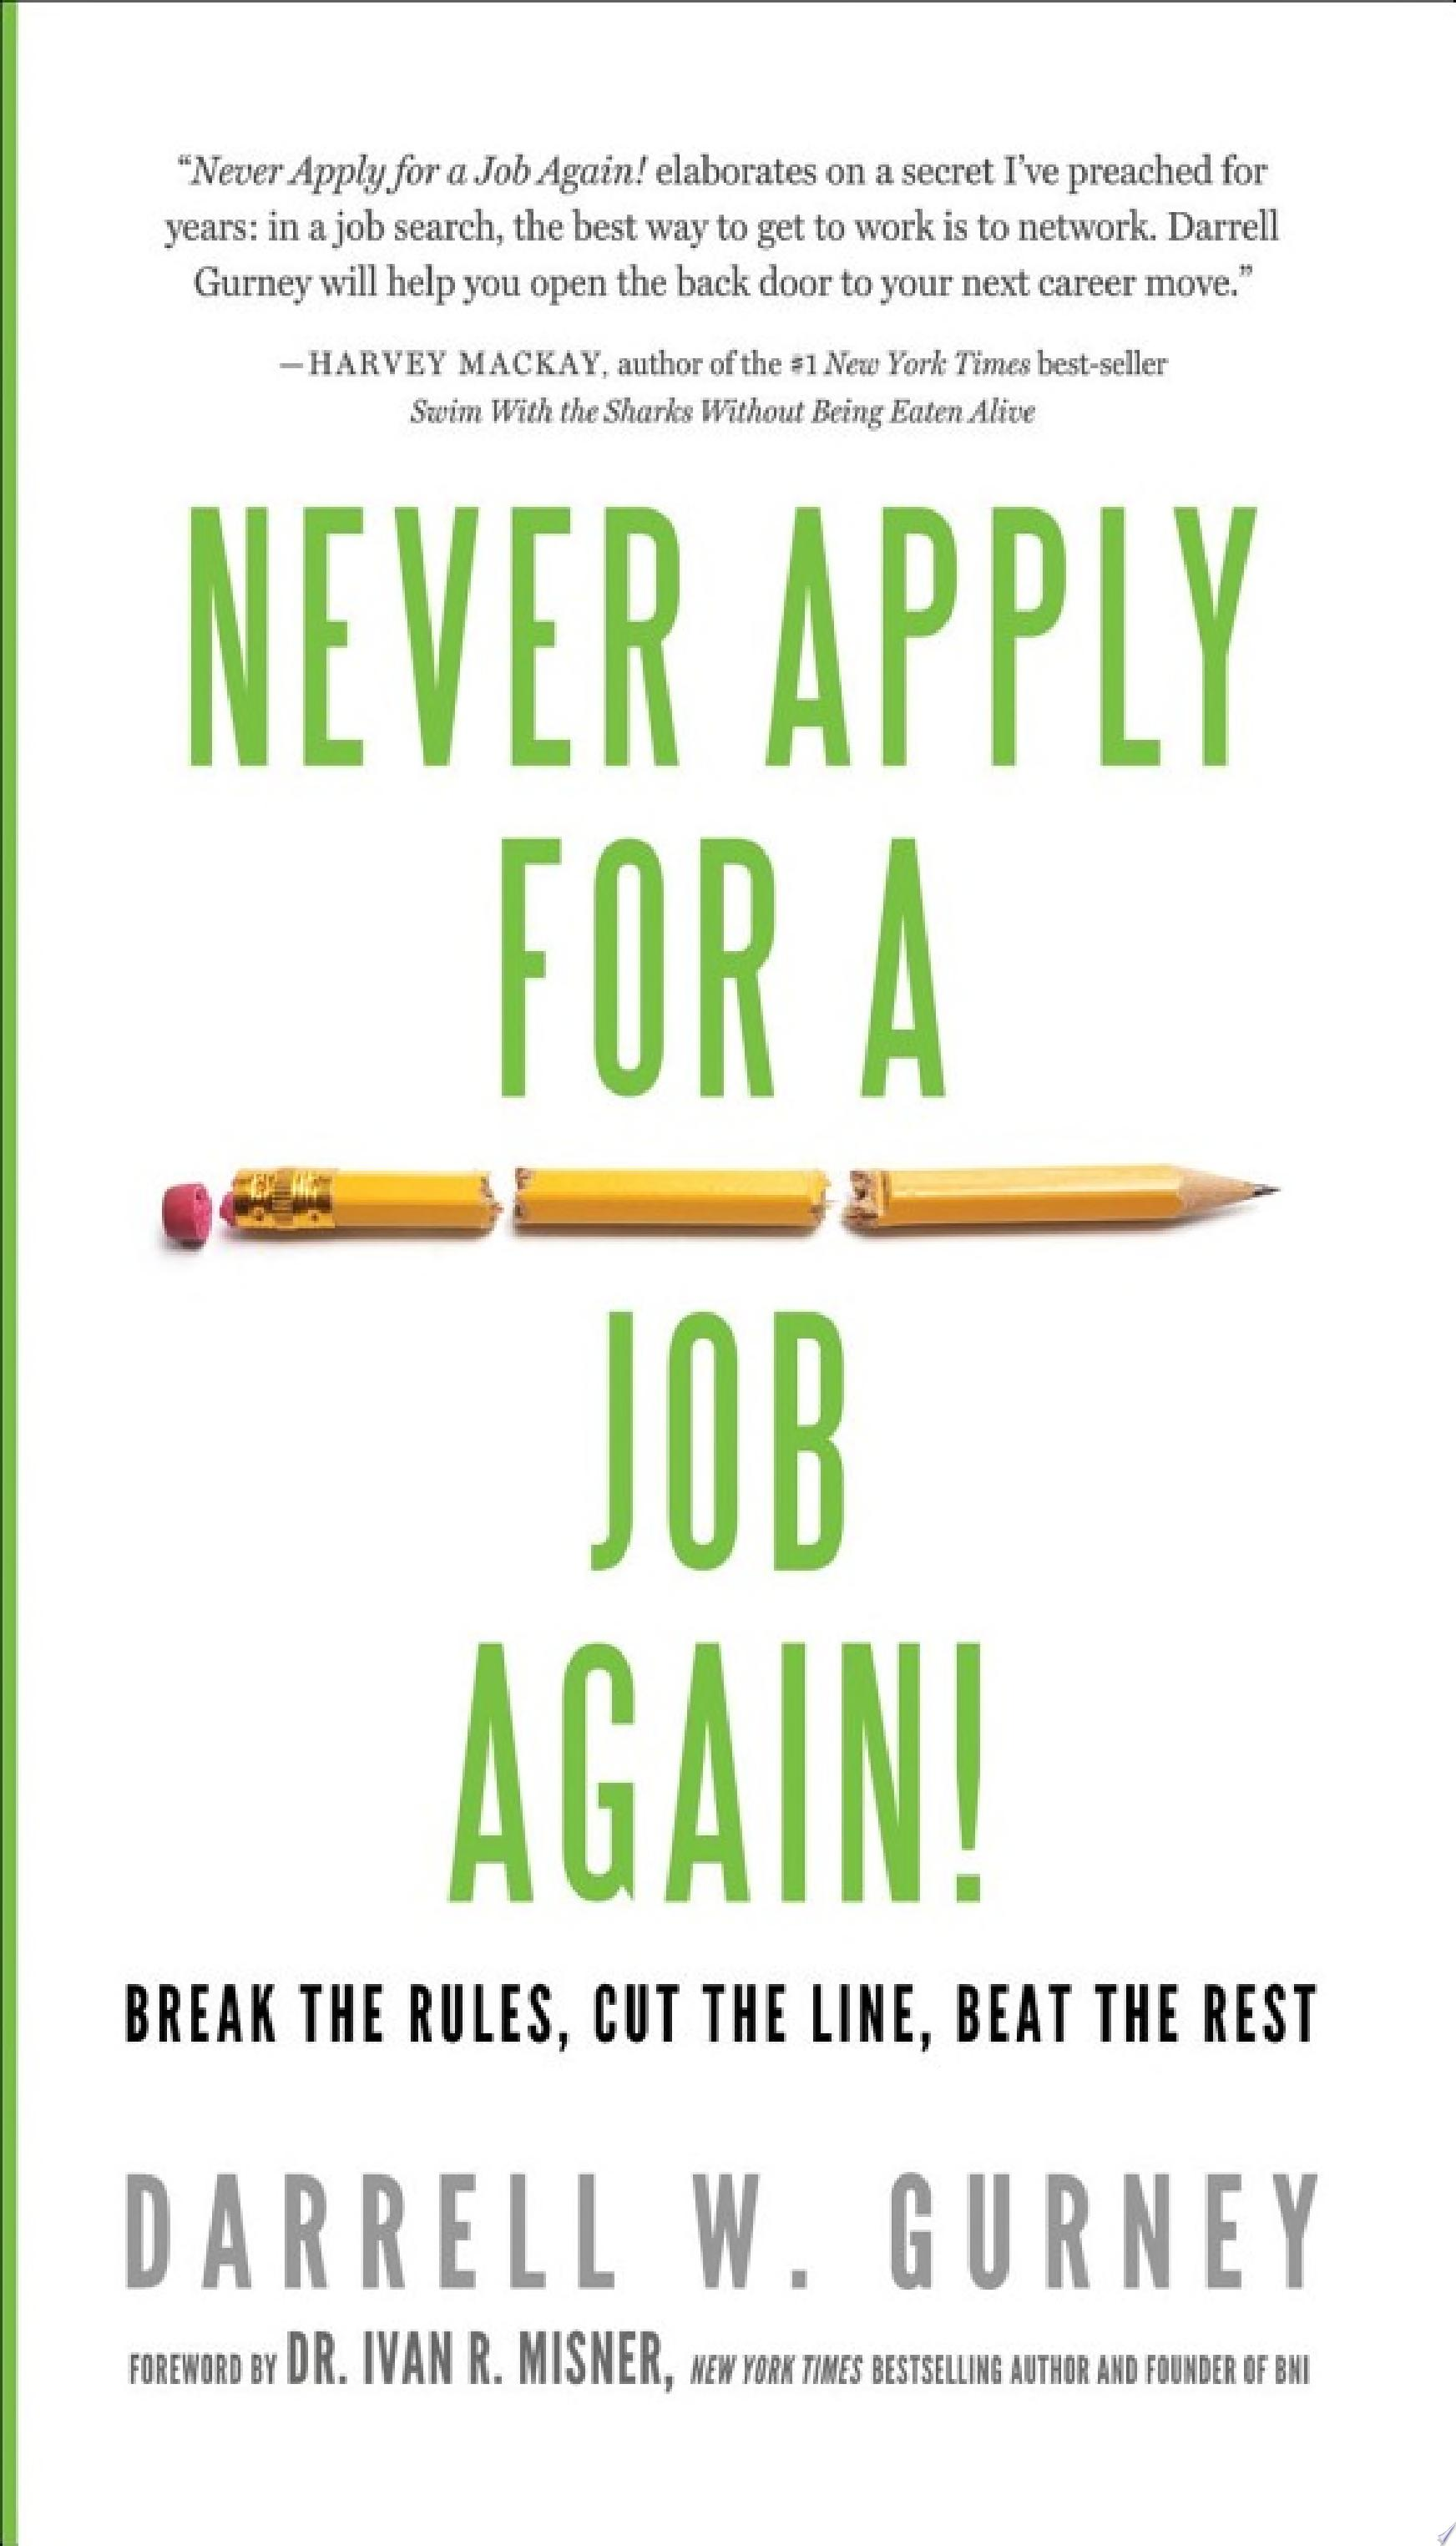 Never Apply for a Job Again